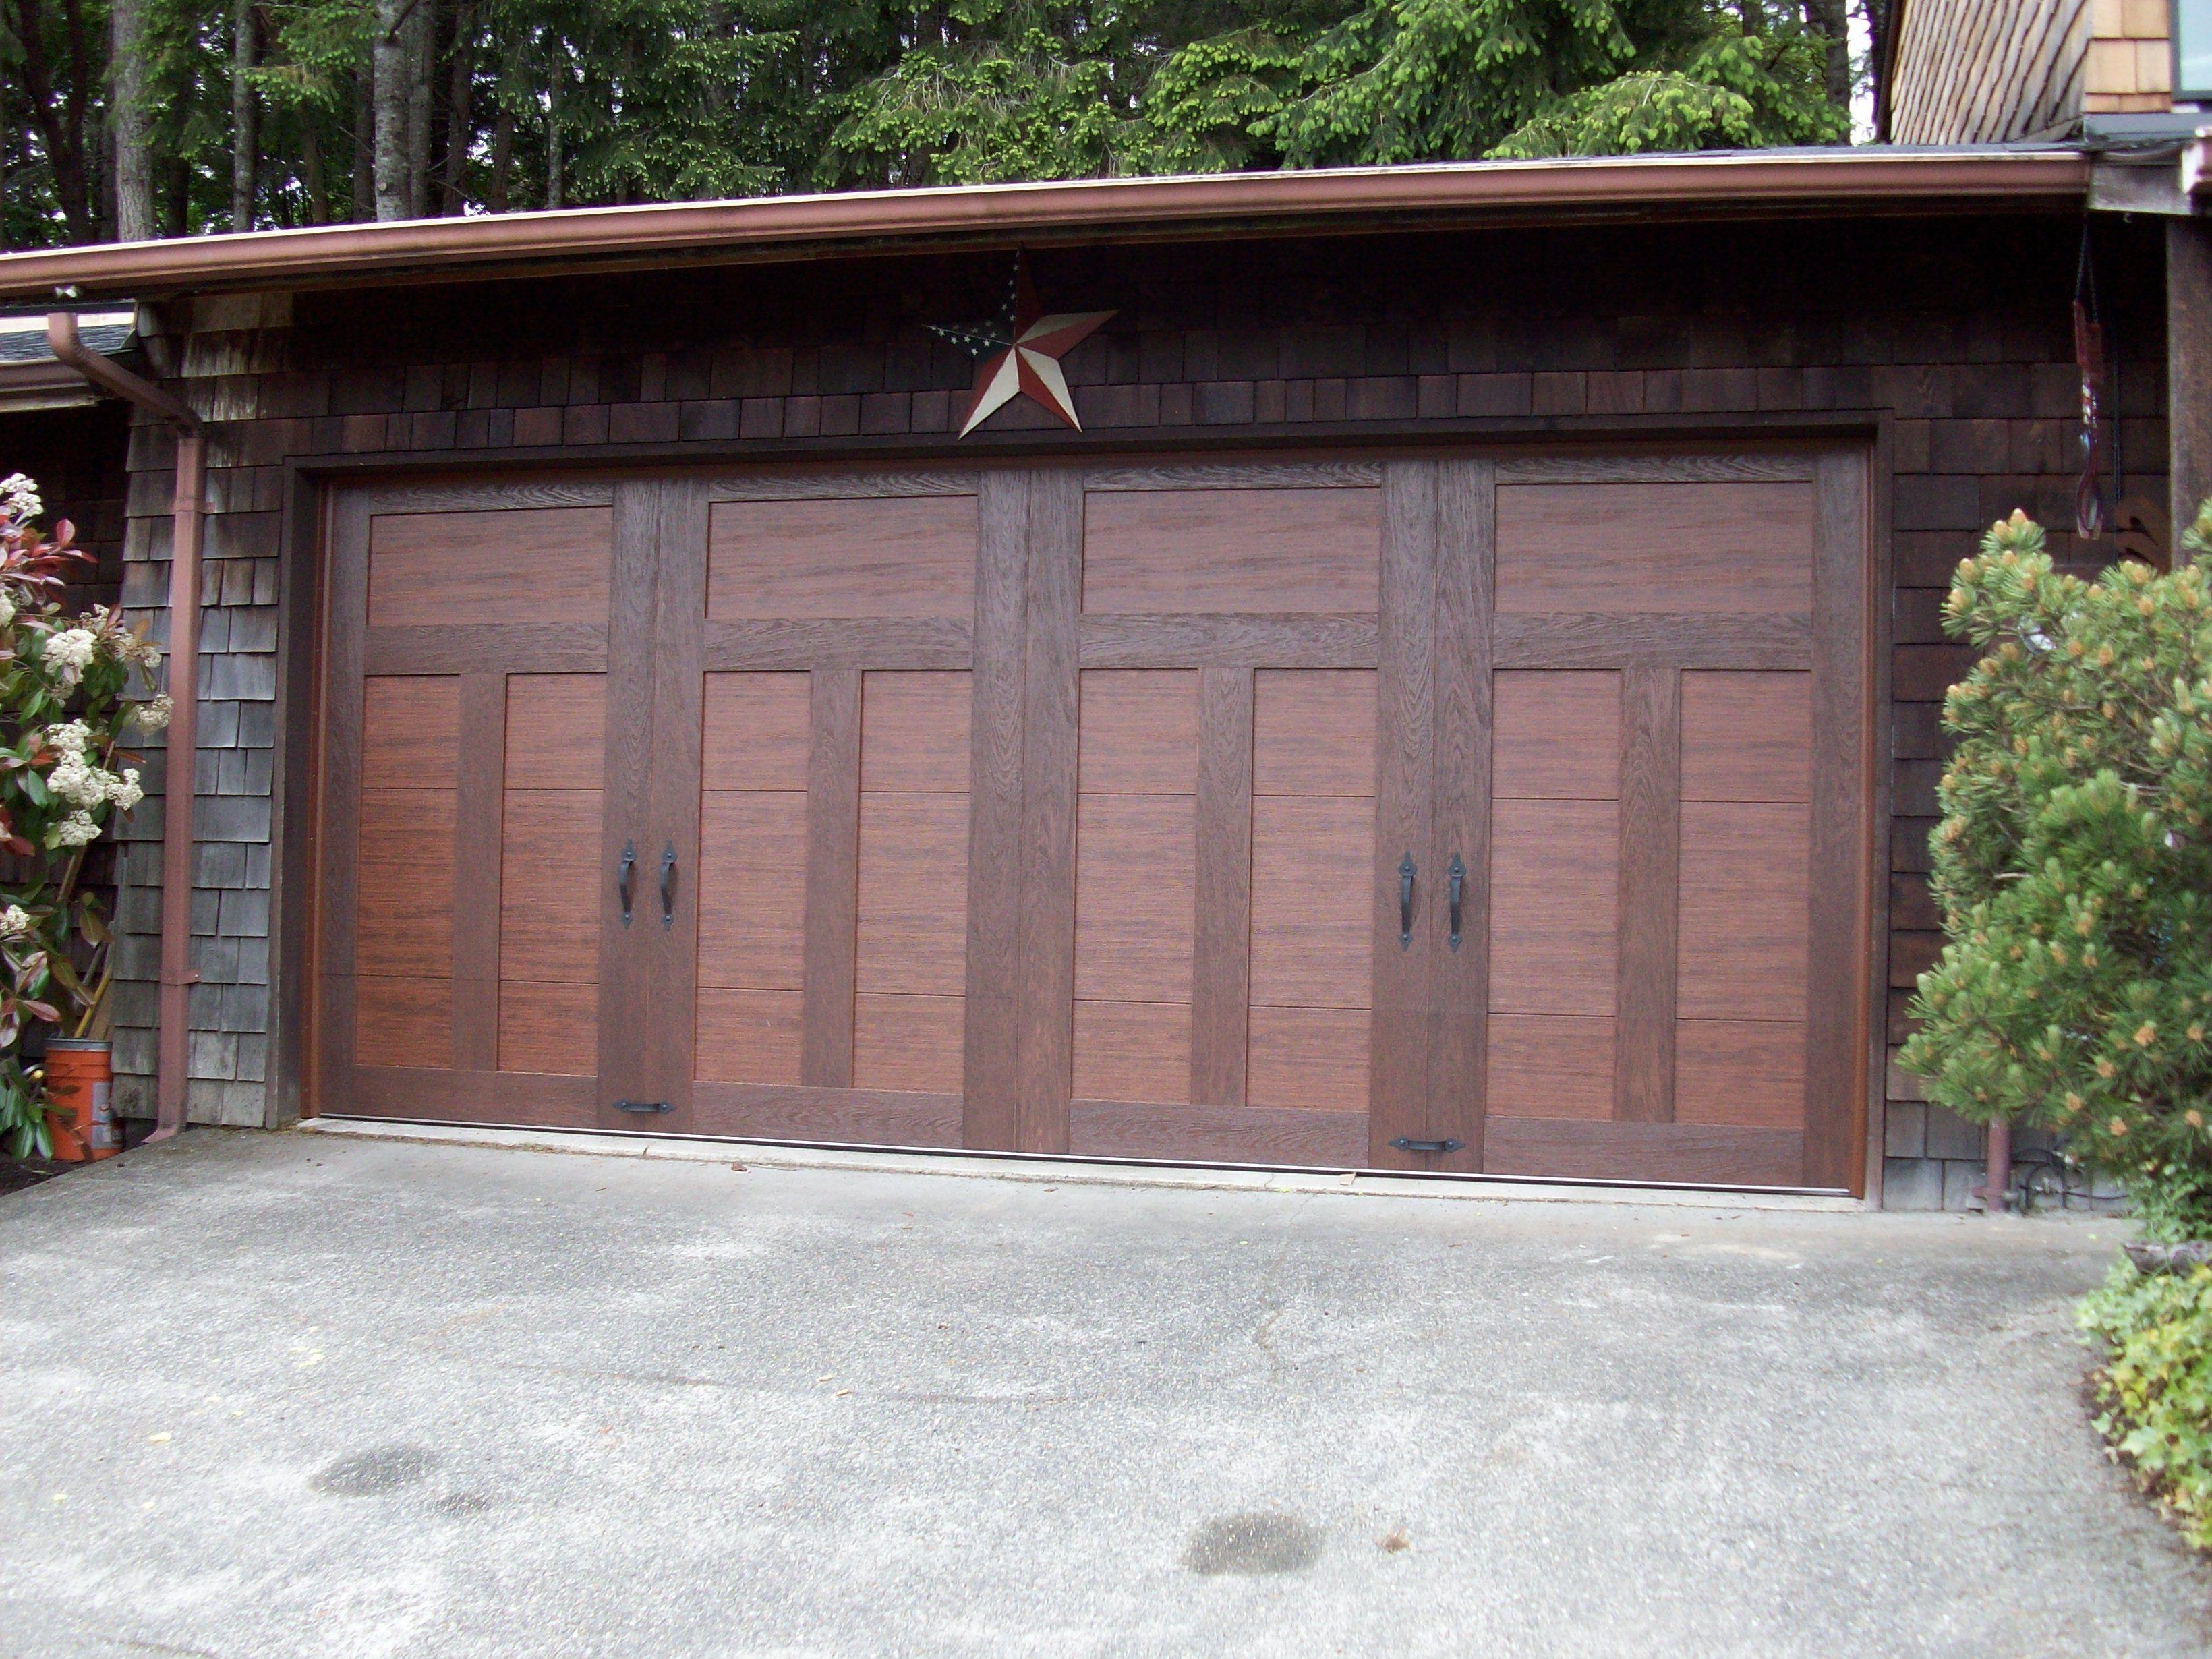 Merveilleux Clopay Canyon Ridge Door Installed By Kitsap Garage Door In Bremerton, WA.  #Kitsapgaragedoor